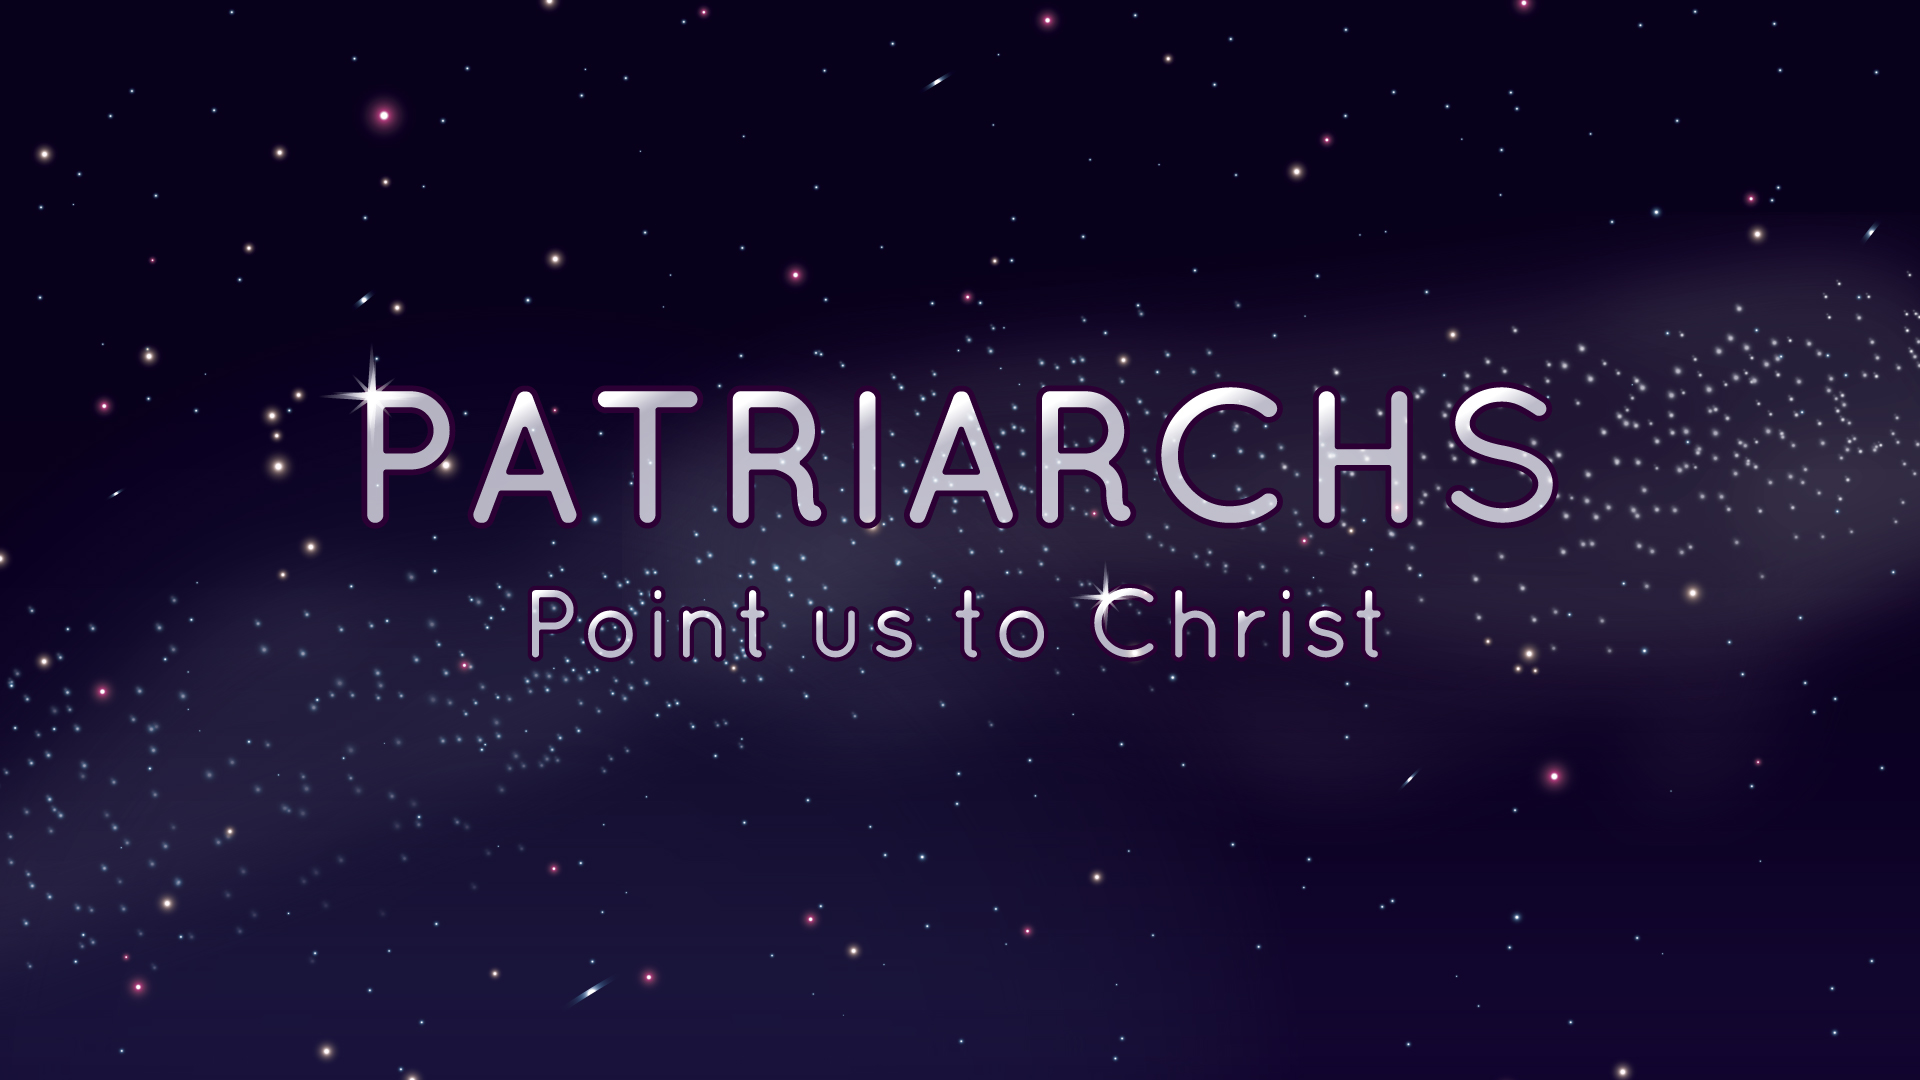 Patriarchs4.jpg